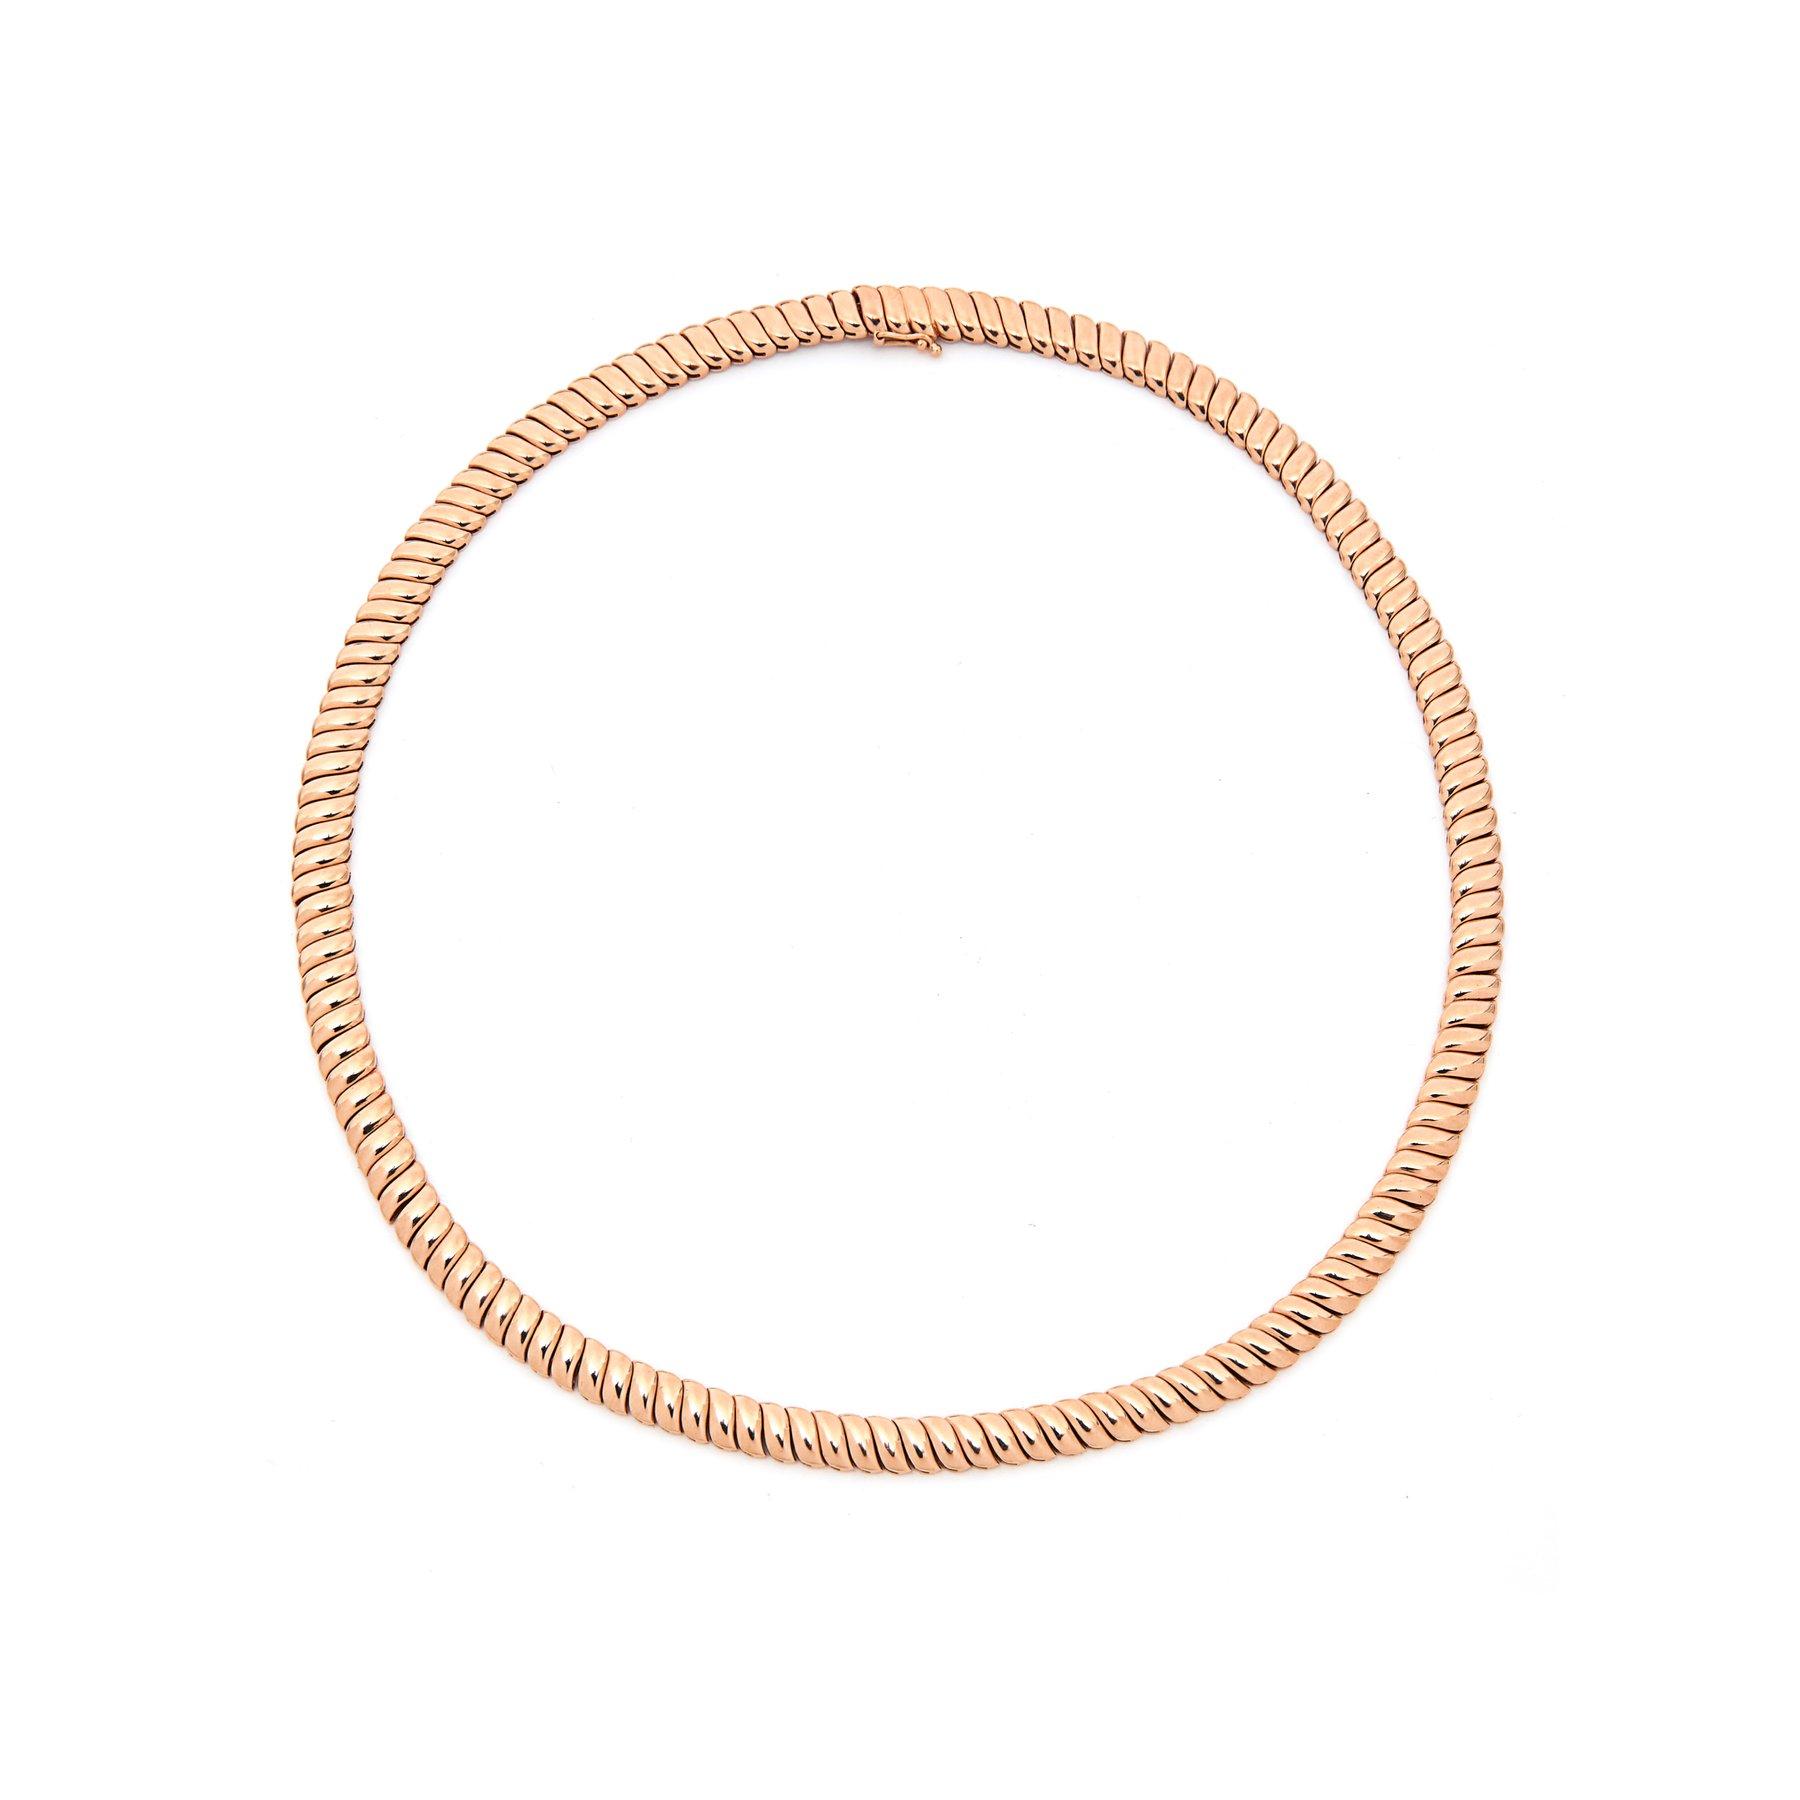 18k gold plain Zoe choker by ZOE CHOKER, available on anitako.com for $15550 Hailey Baldwin Jewellery Exact Product